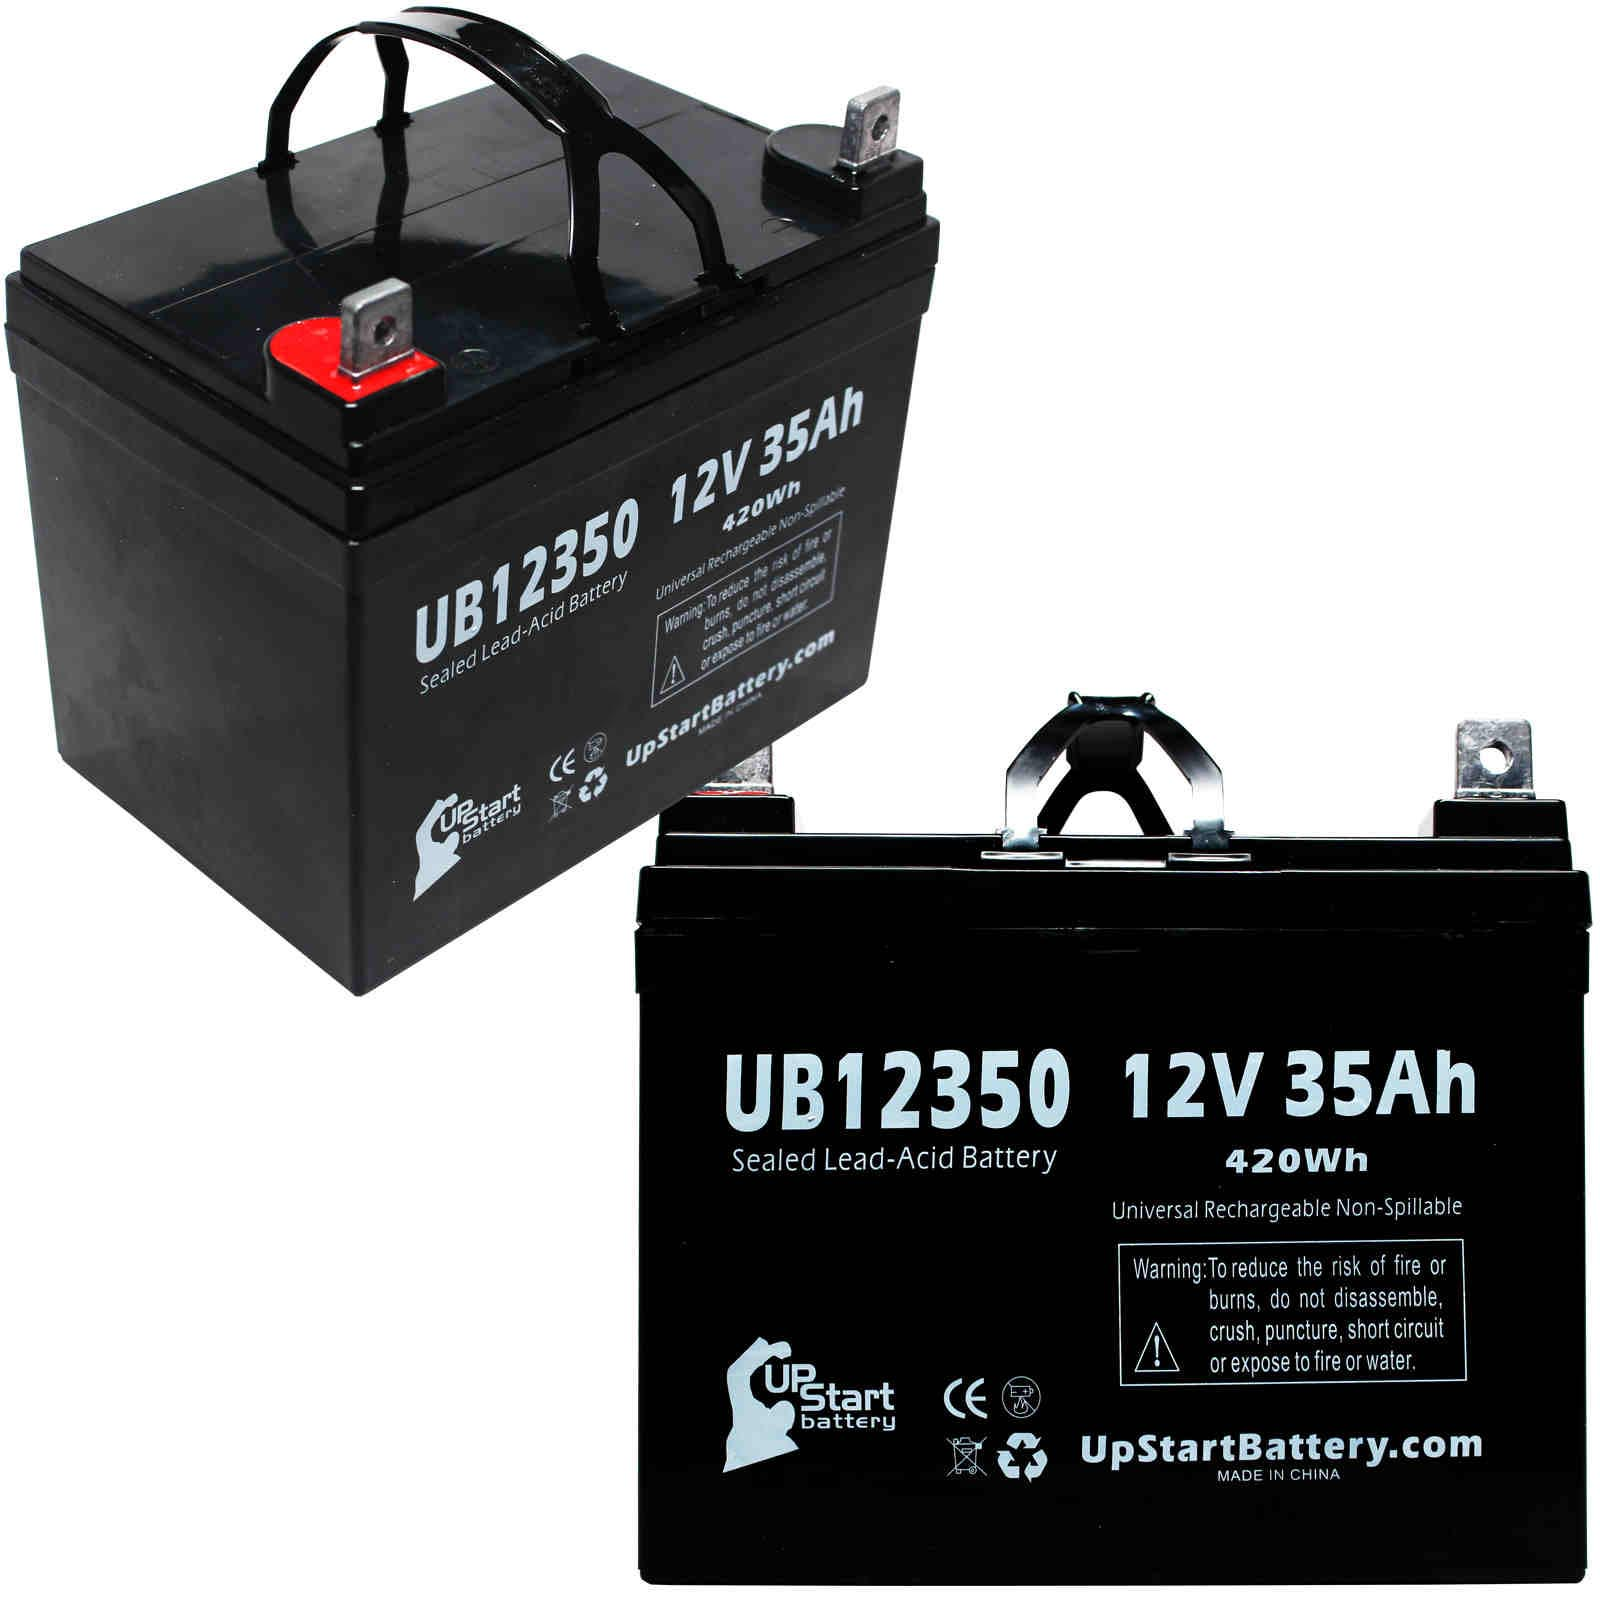 2 Pack Pride Mobility Scooter Battery Ub12350 12v 35ah